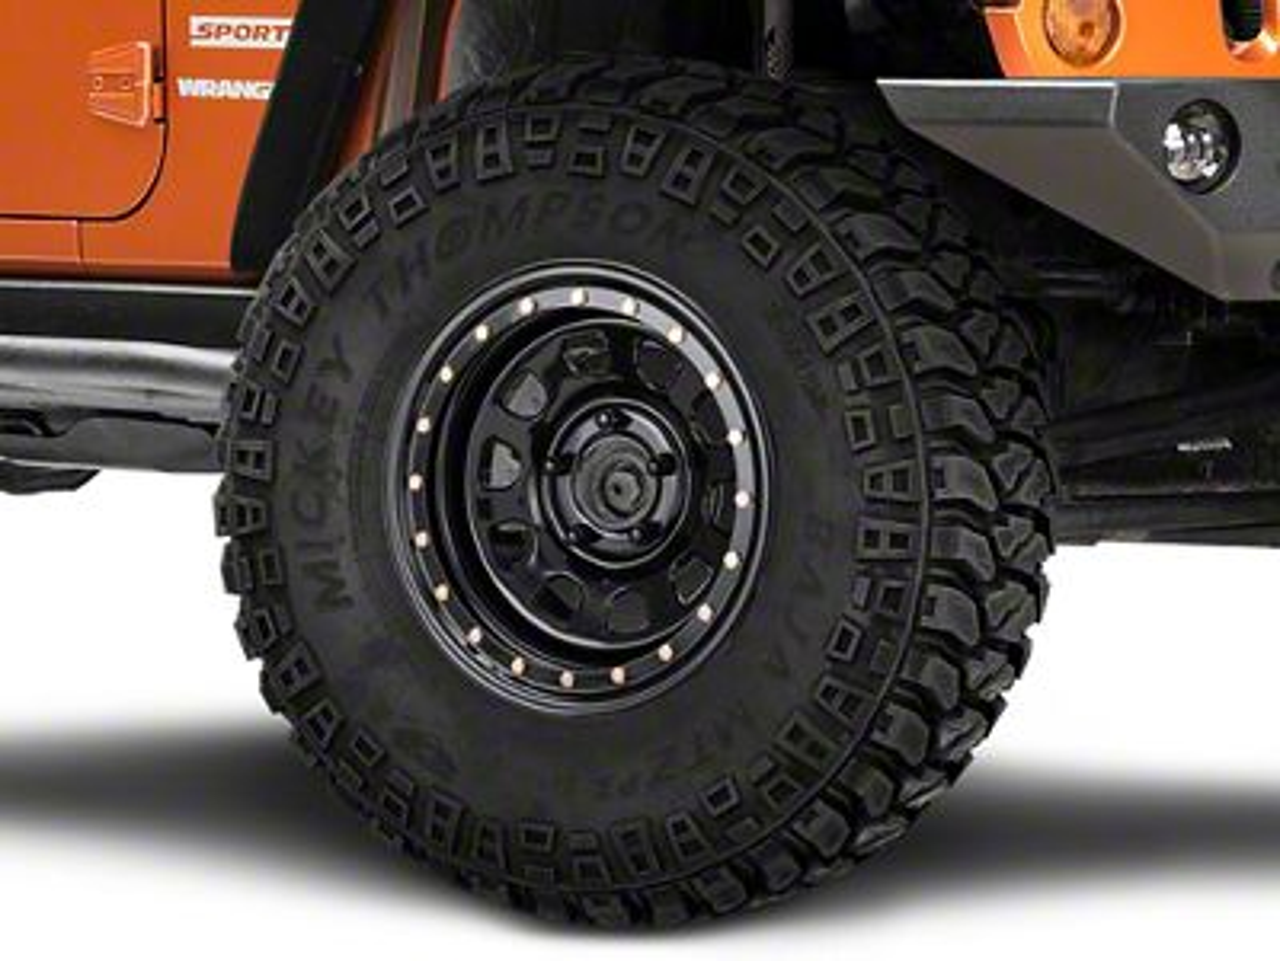 Pro Comp Steel Series 252 Street Lock Gloss Black Wheel - 16x8 (07-18 Jeep Wrangler JK)